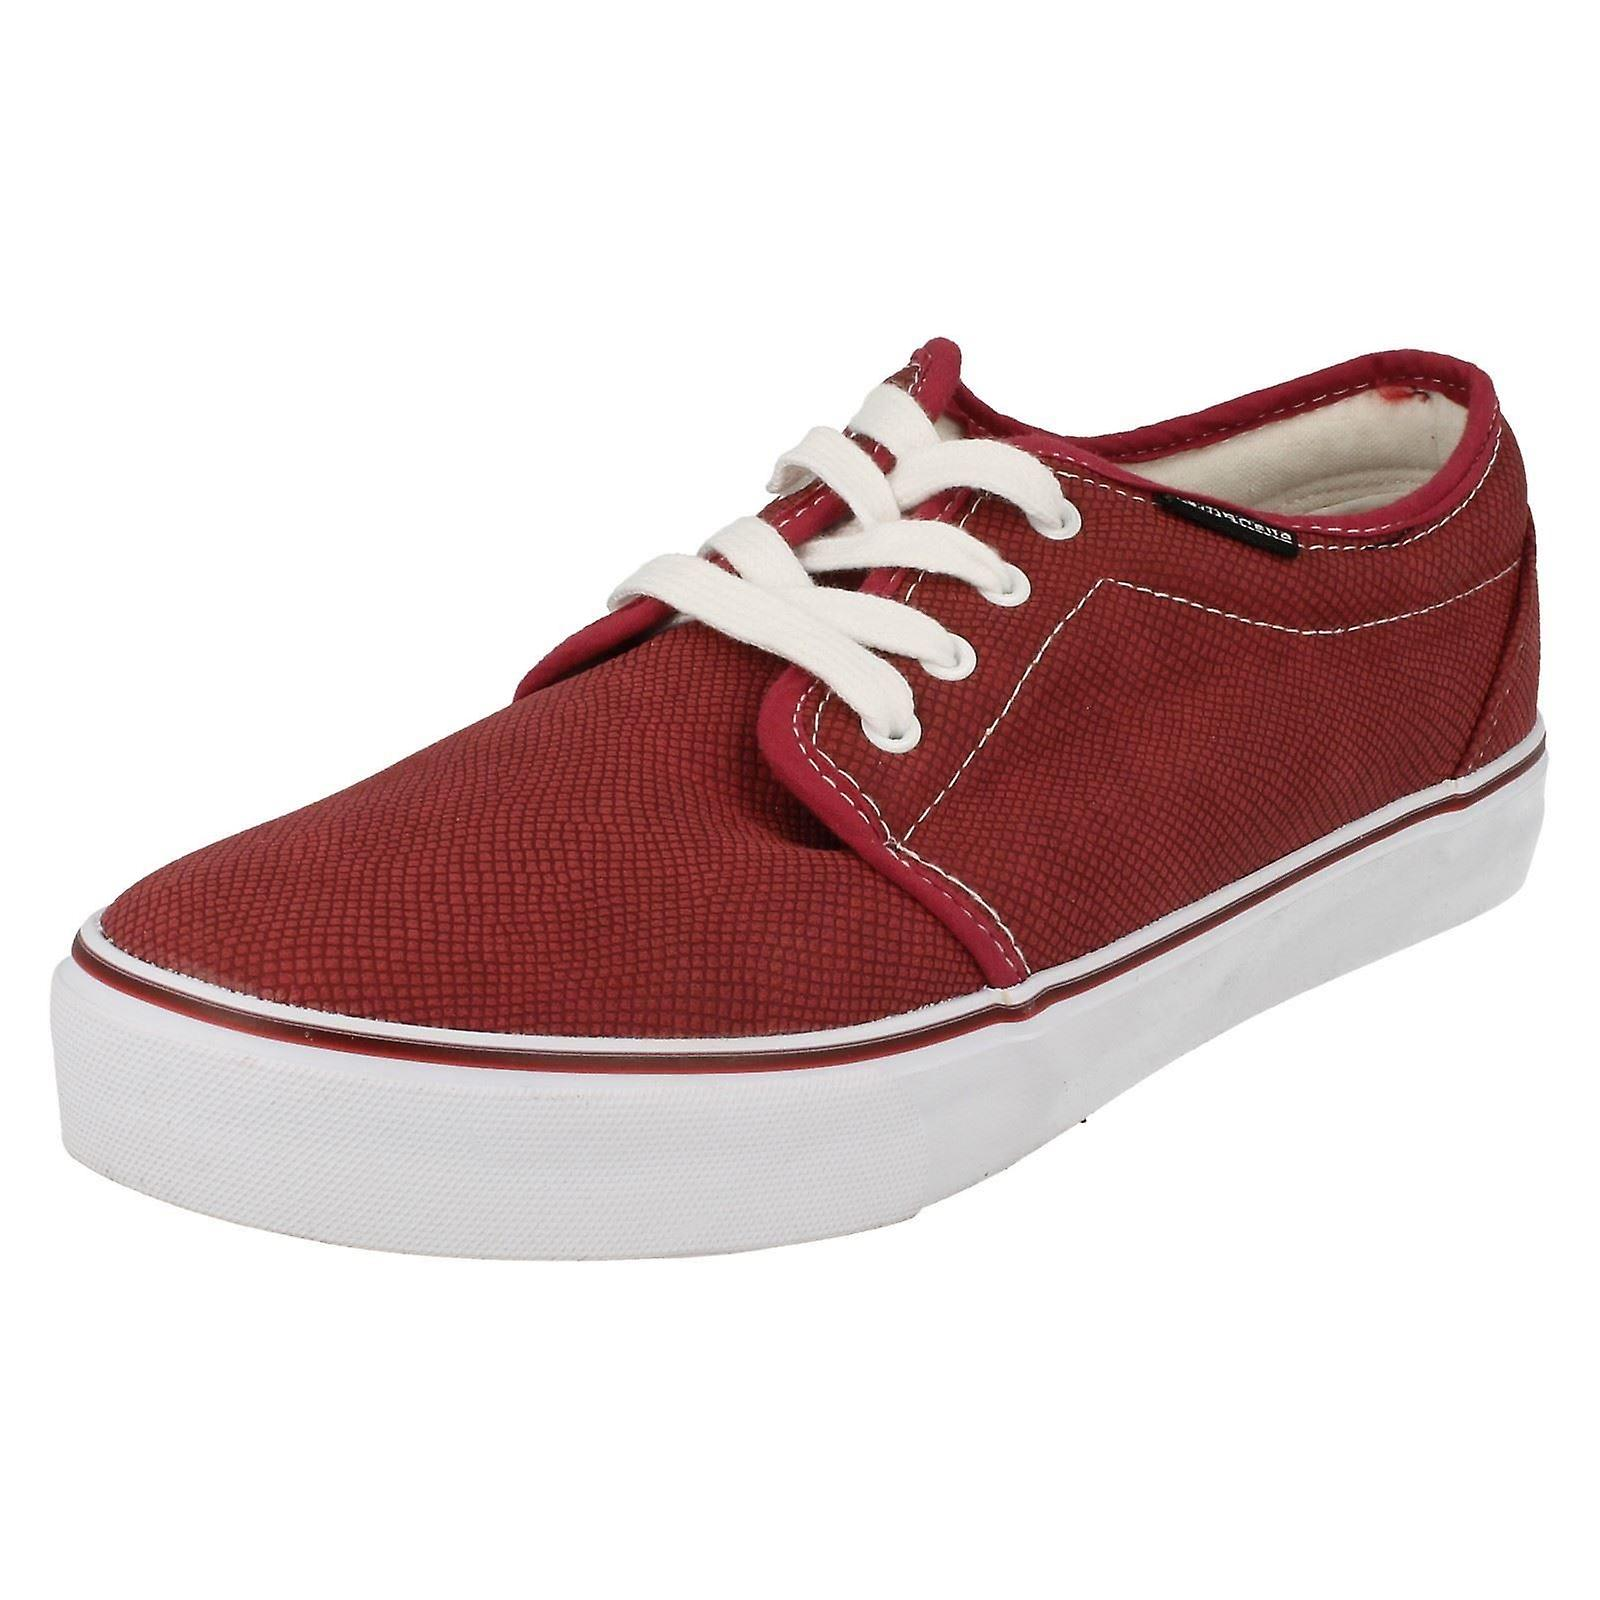 41cac402afca4e Arnaldo Toscani - 1099915 Women s Sneakers Shoe - bd254e - schlemme ...